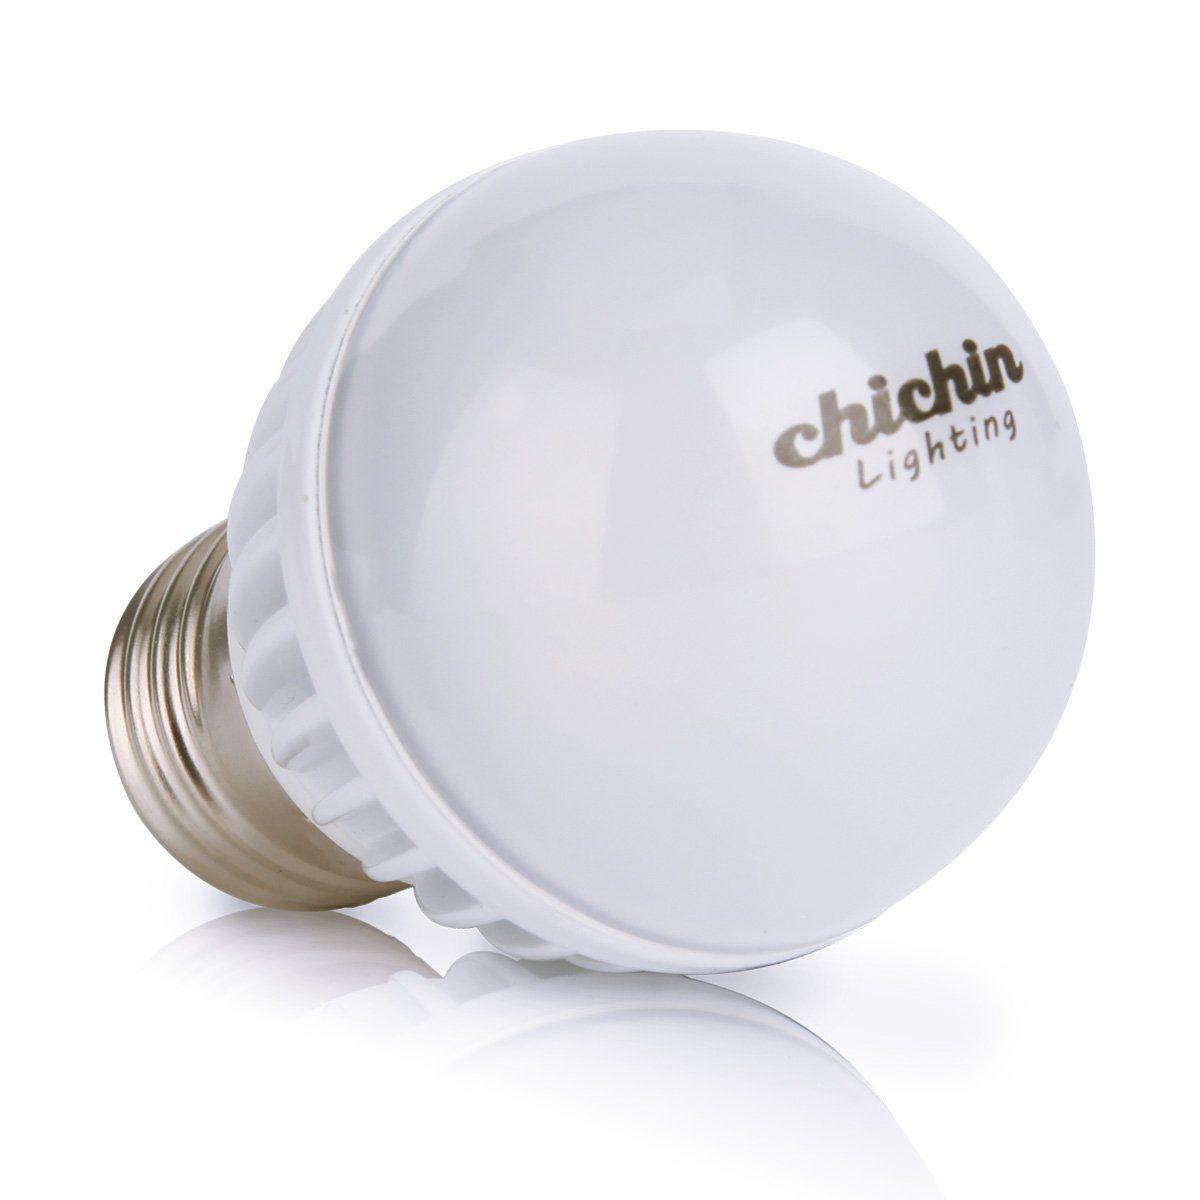 Chichinlighting E26 Screw Base 12 Volt Ac Dc 5 6 Watt Rv Camper Marine Low Voltage Led Light Bulb Warm White Low Voltage Led Lighting Led Light Bulb Led Bulb